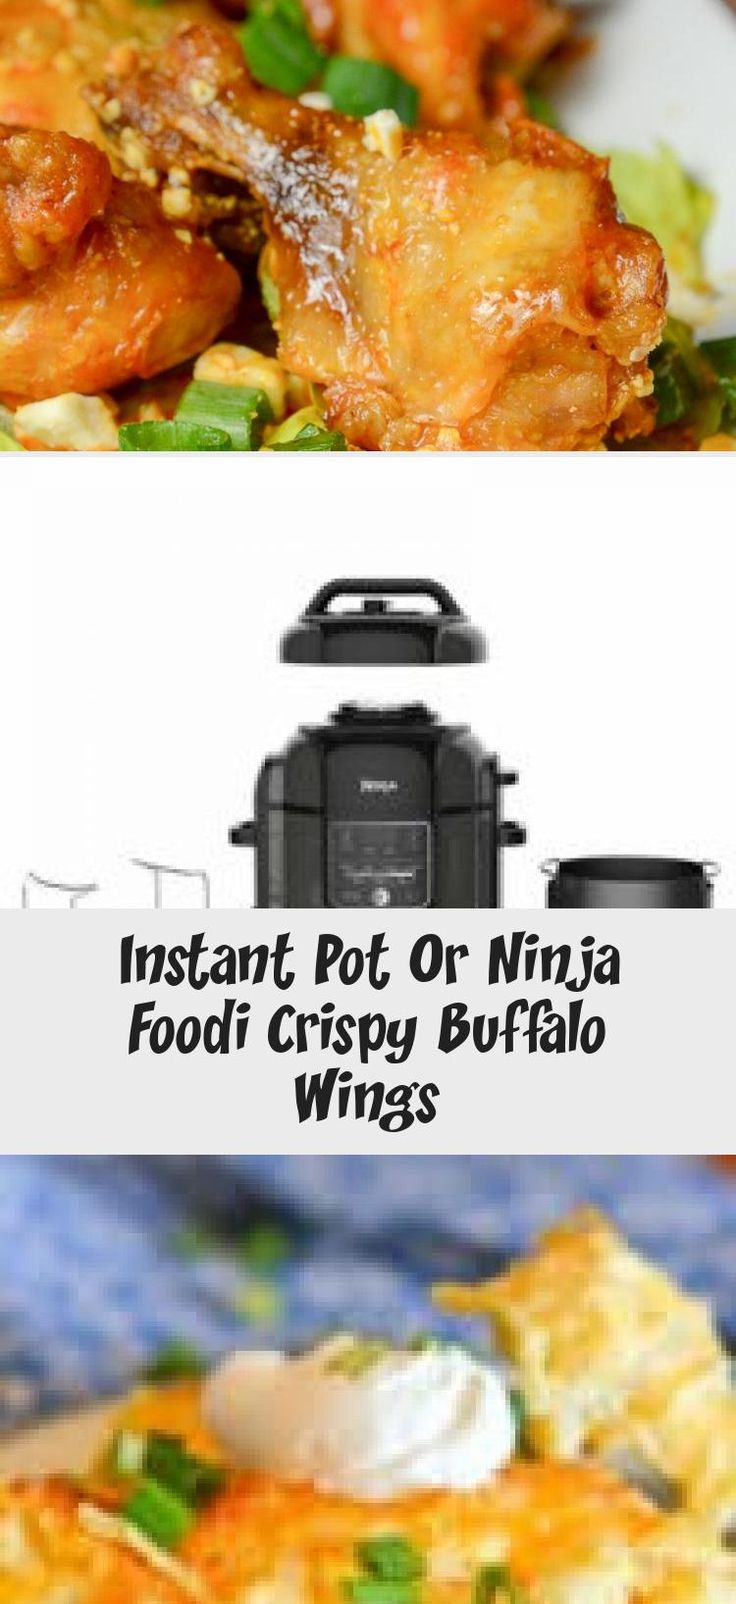 Instant pot or ninja foodi crispy buffalo wings via